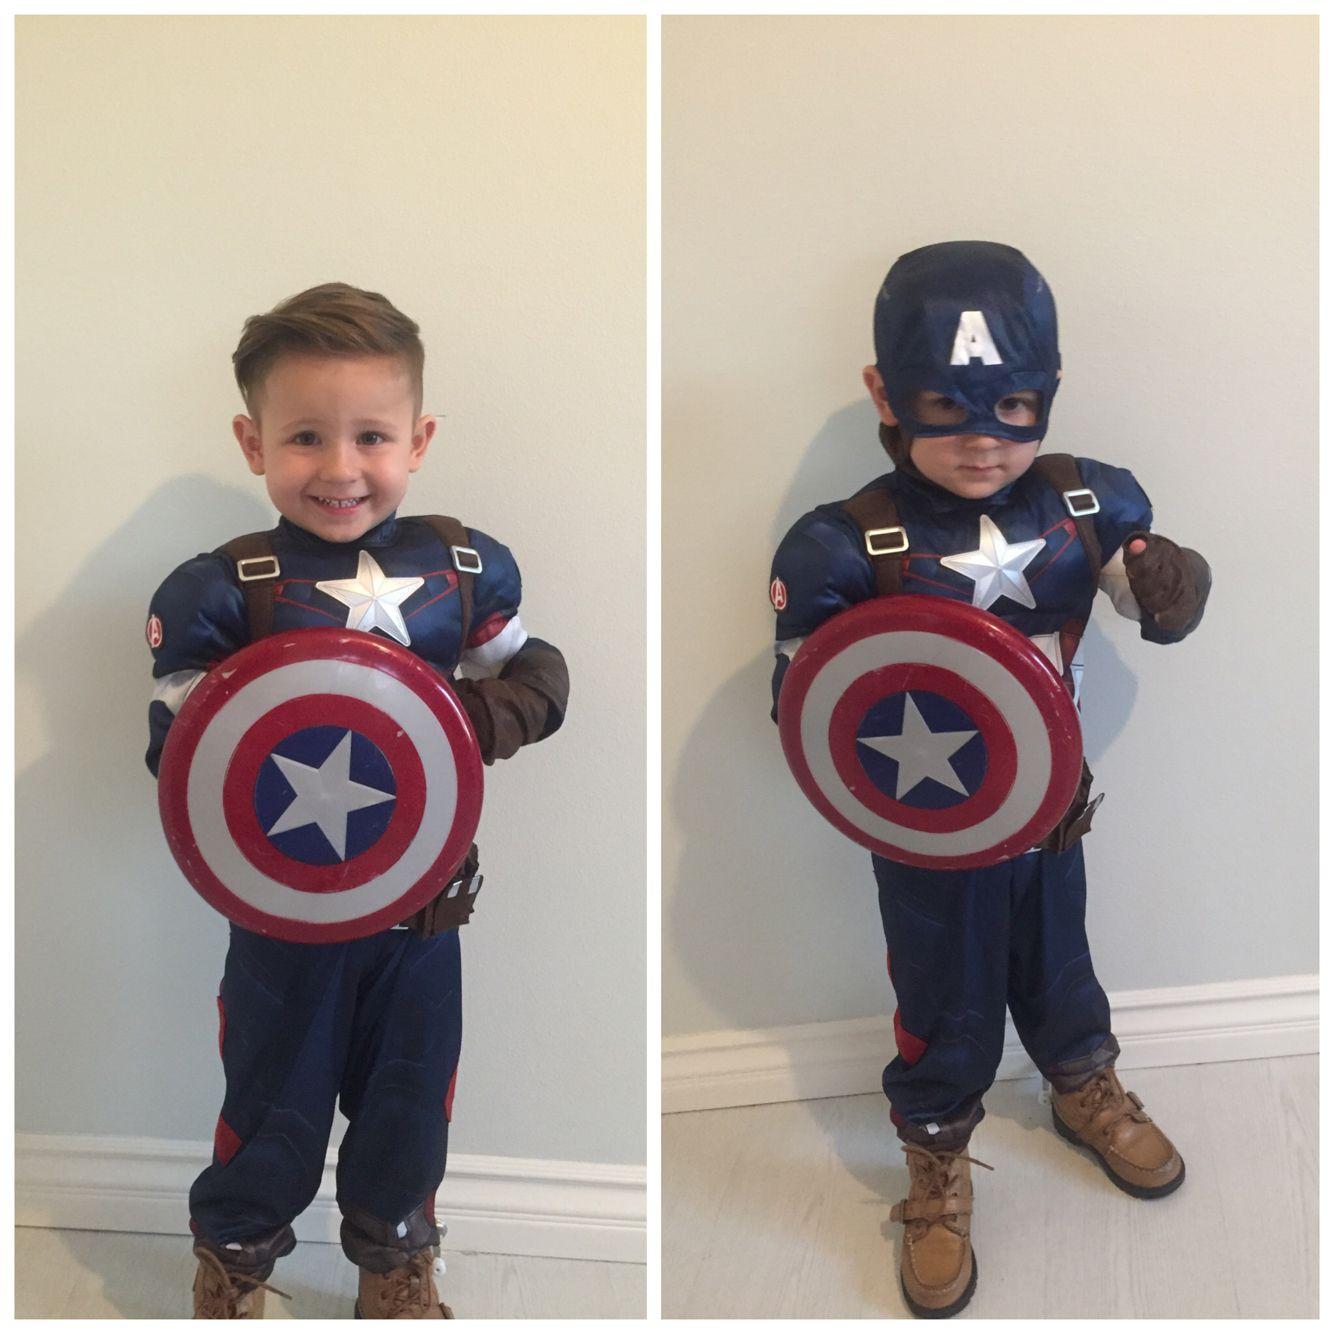 Captain America Halloween Costume kids, toddlers. | Halloween ...